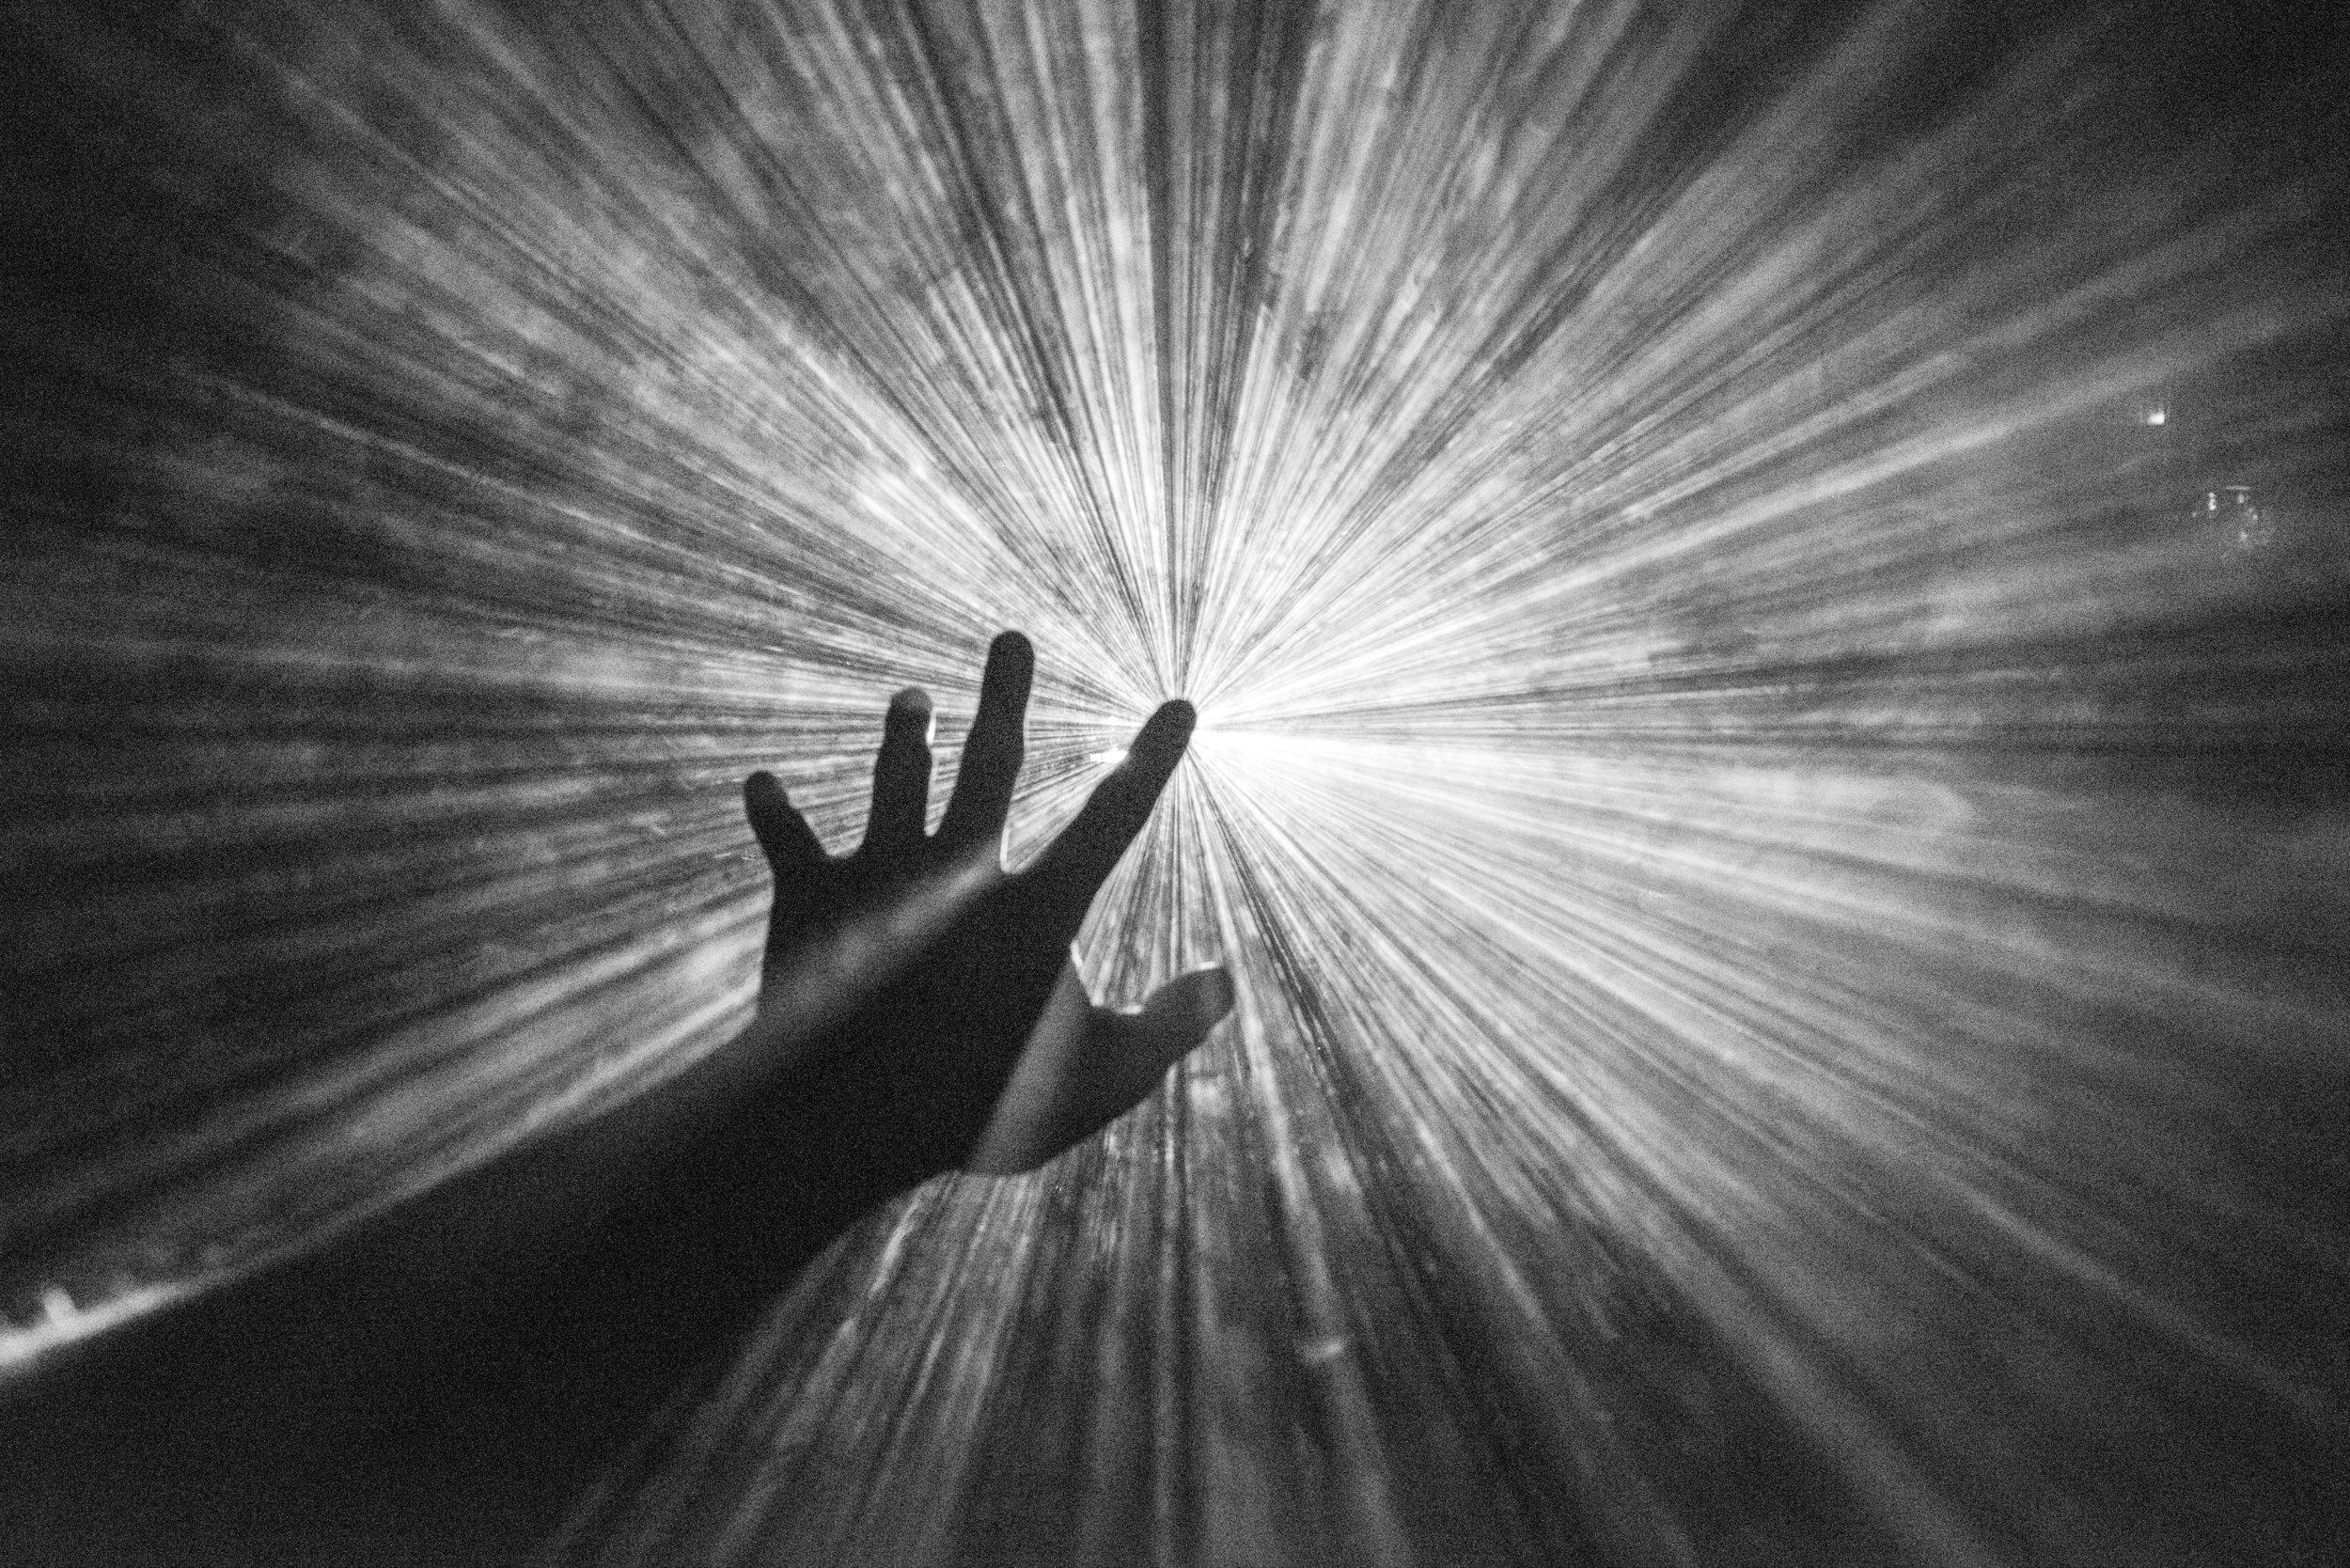 Ayahuasca felt like a near-death experience where my consciousness left my body. The temporary death of my ego allowed my essential-self to emerge.